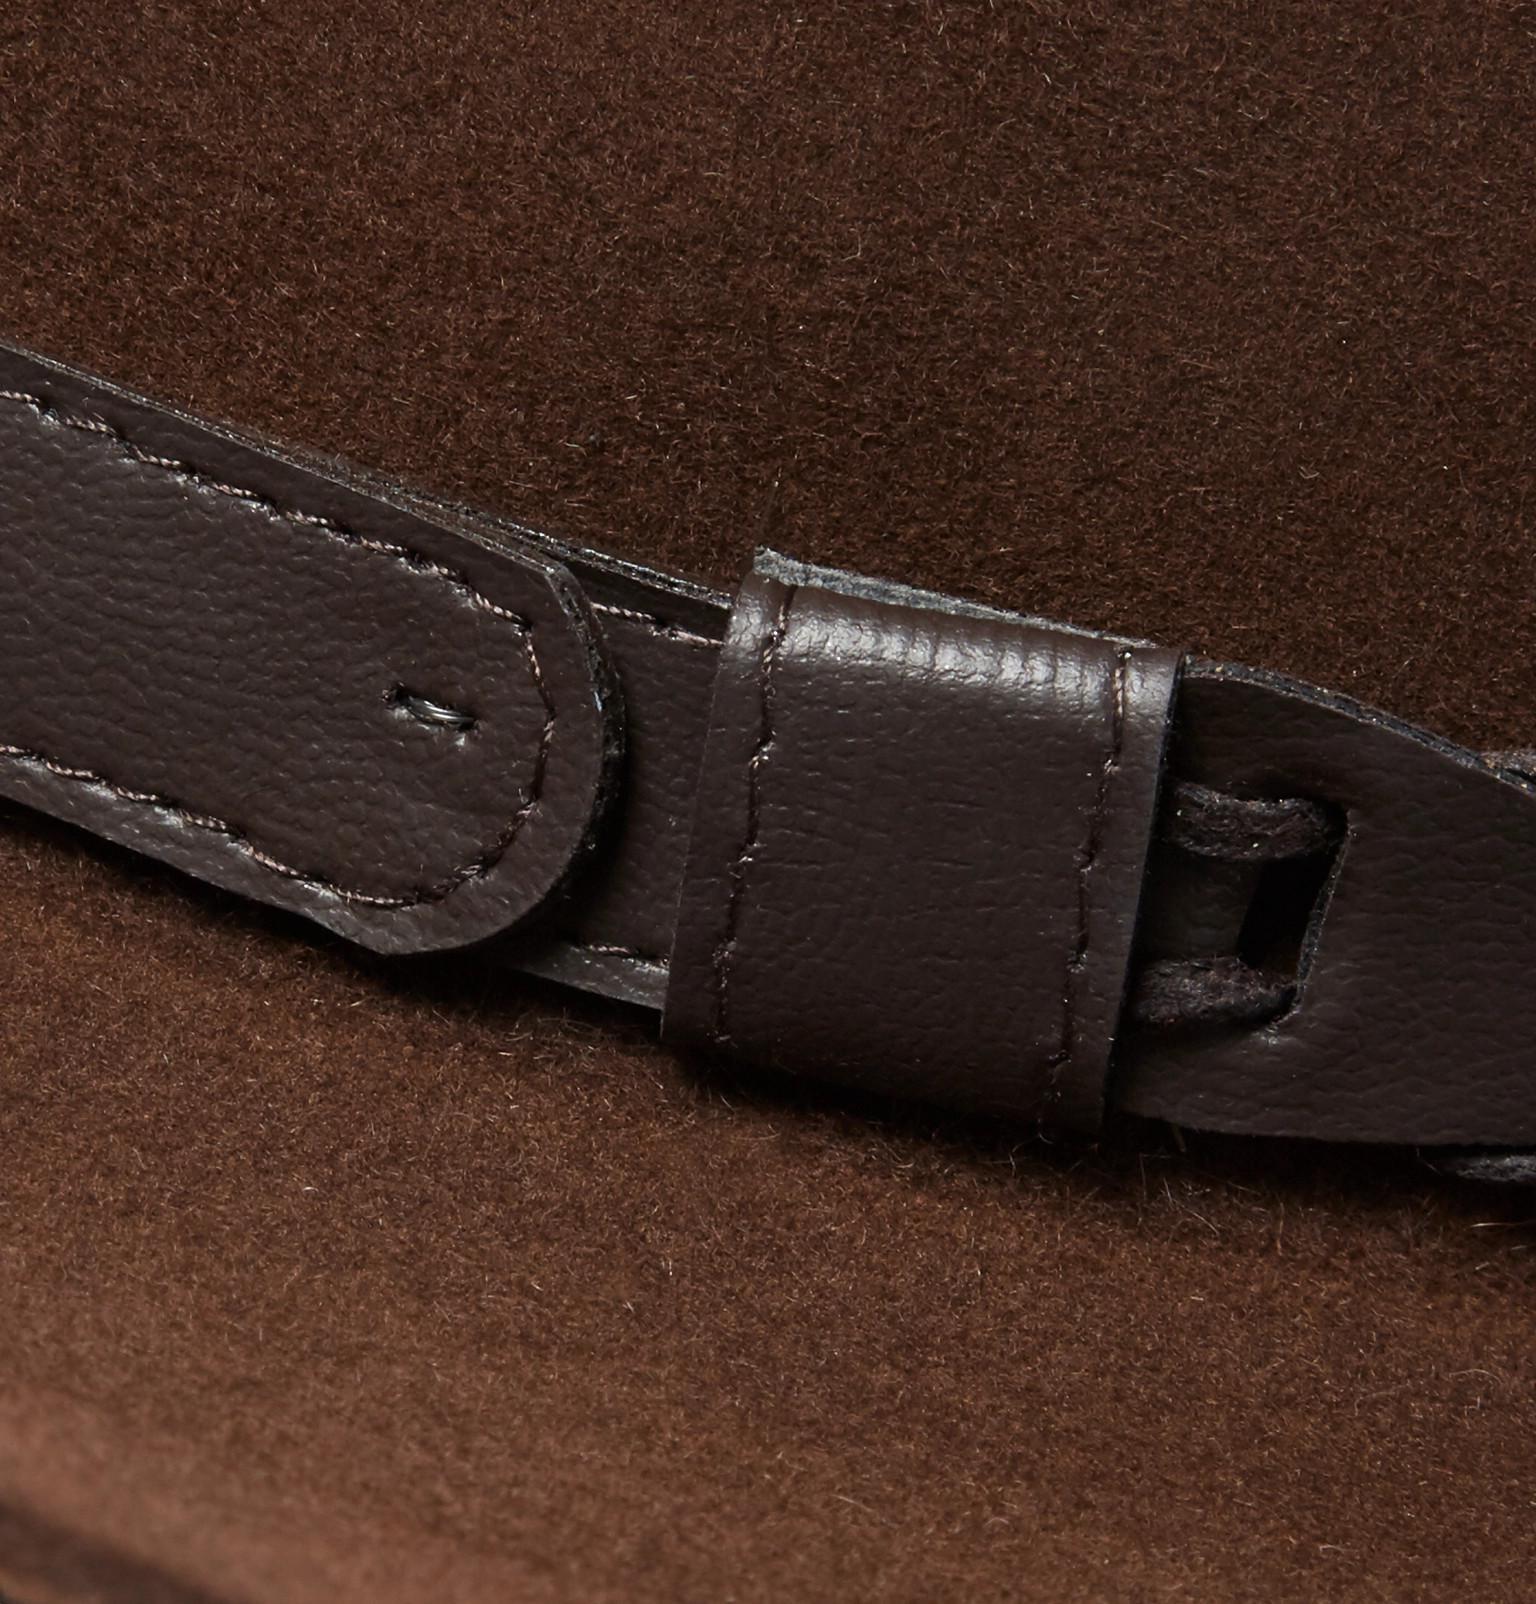 3f9b0a4ae23 Lyst - Kingsman + Stetson Jack s Statesman Leather-trimmed Felt Hat ...